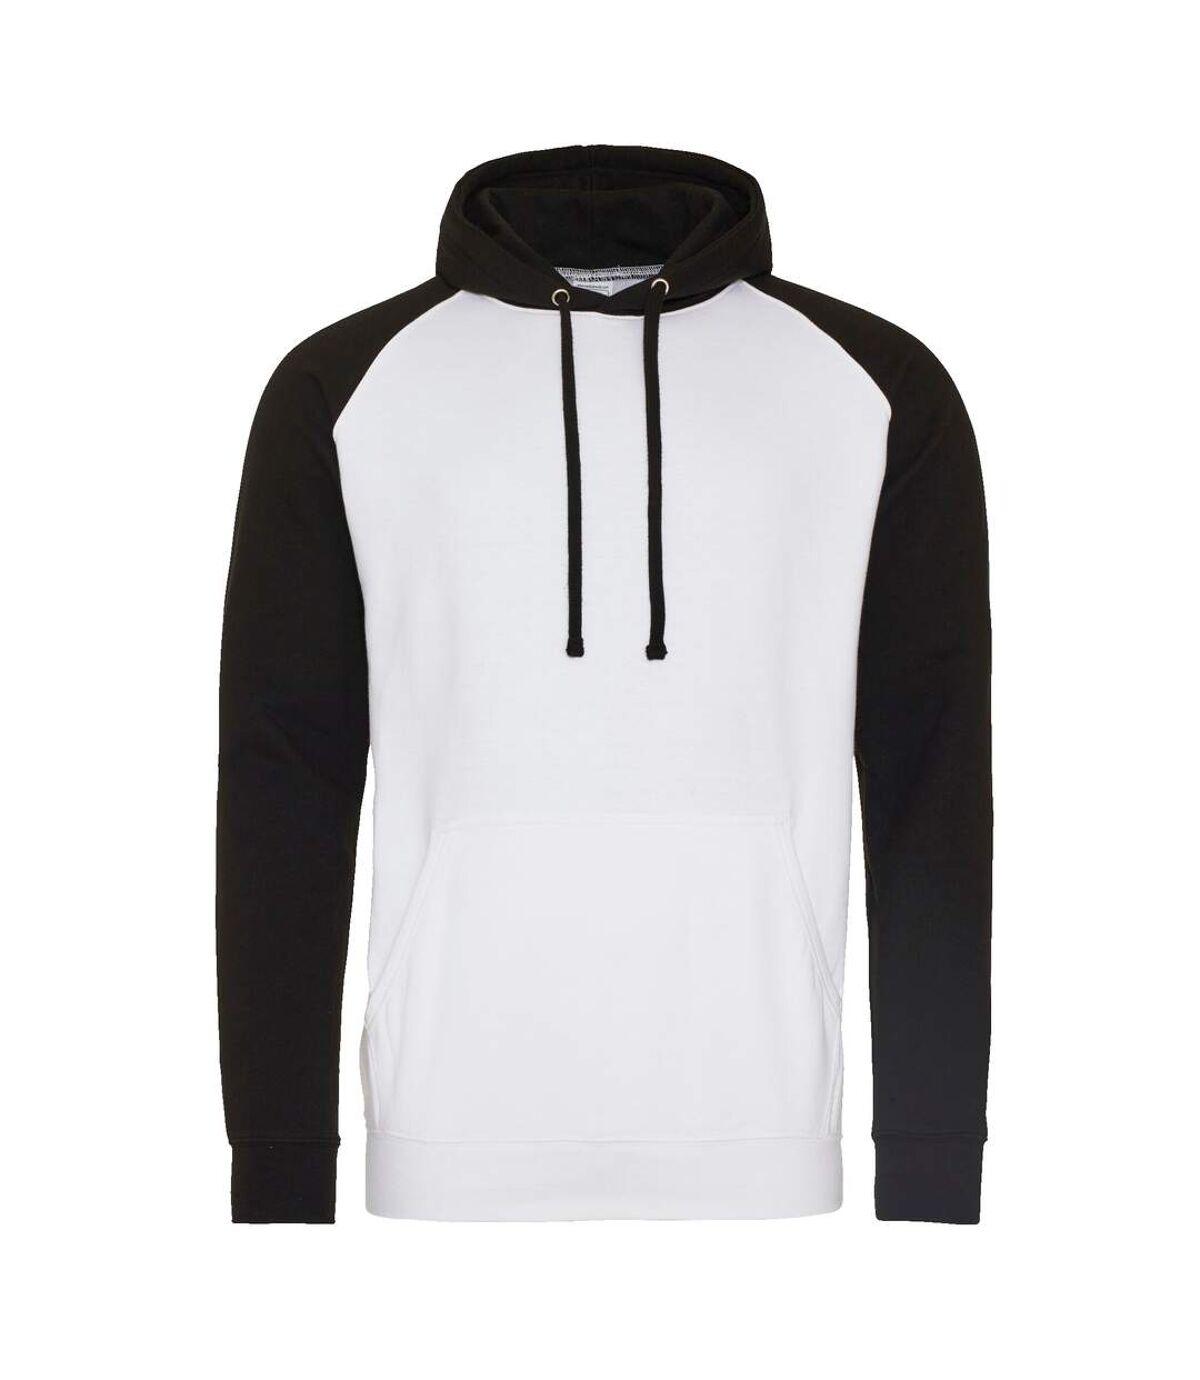 Awdis Just Hoods Adults Unisex Two Tone Hooded Baseball Sweatshirt/Hoodie (Arctic White/ Jet Black) - UTRW3928